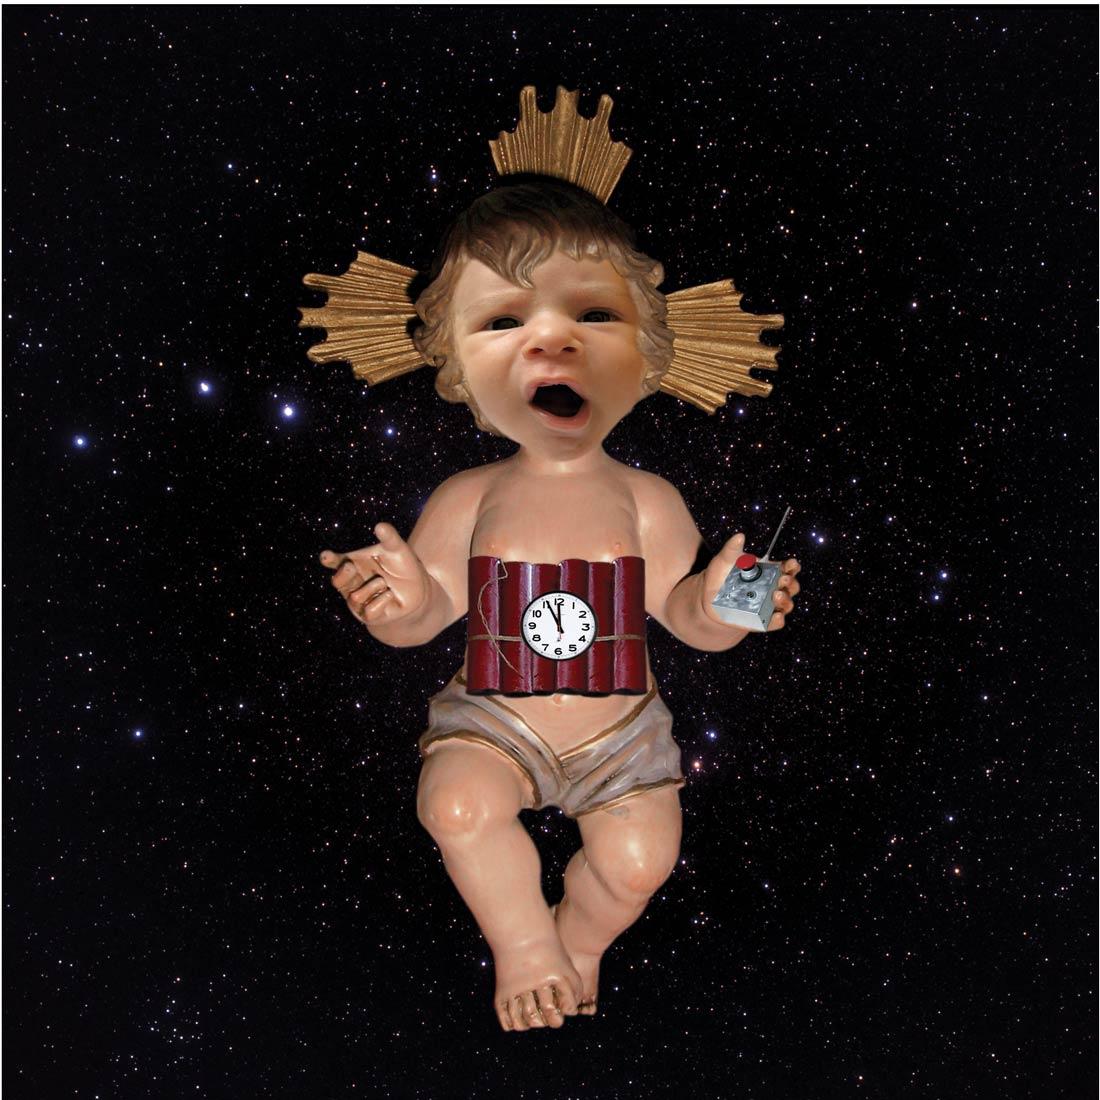 Baby Boom - Max Papeschi